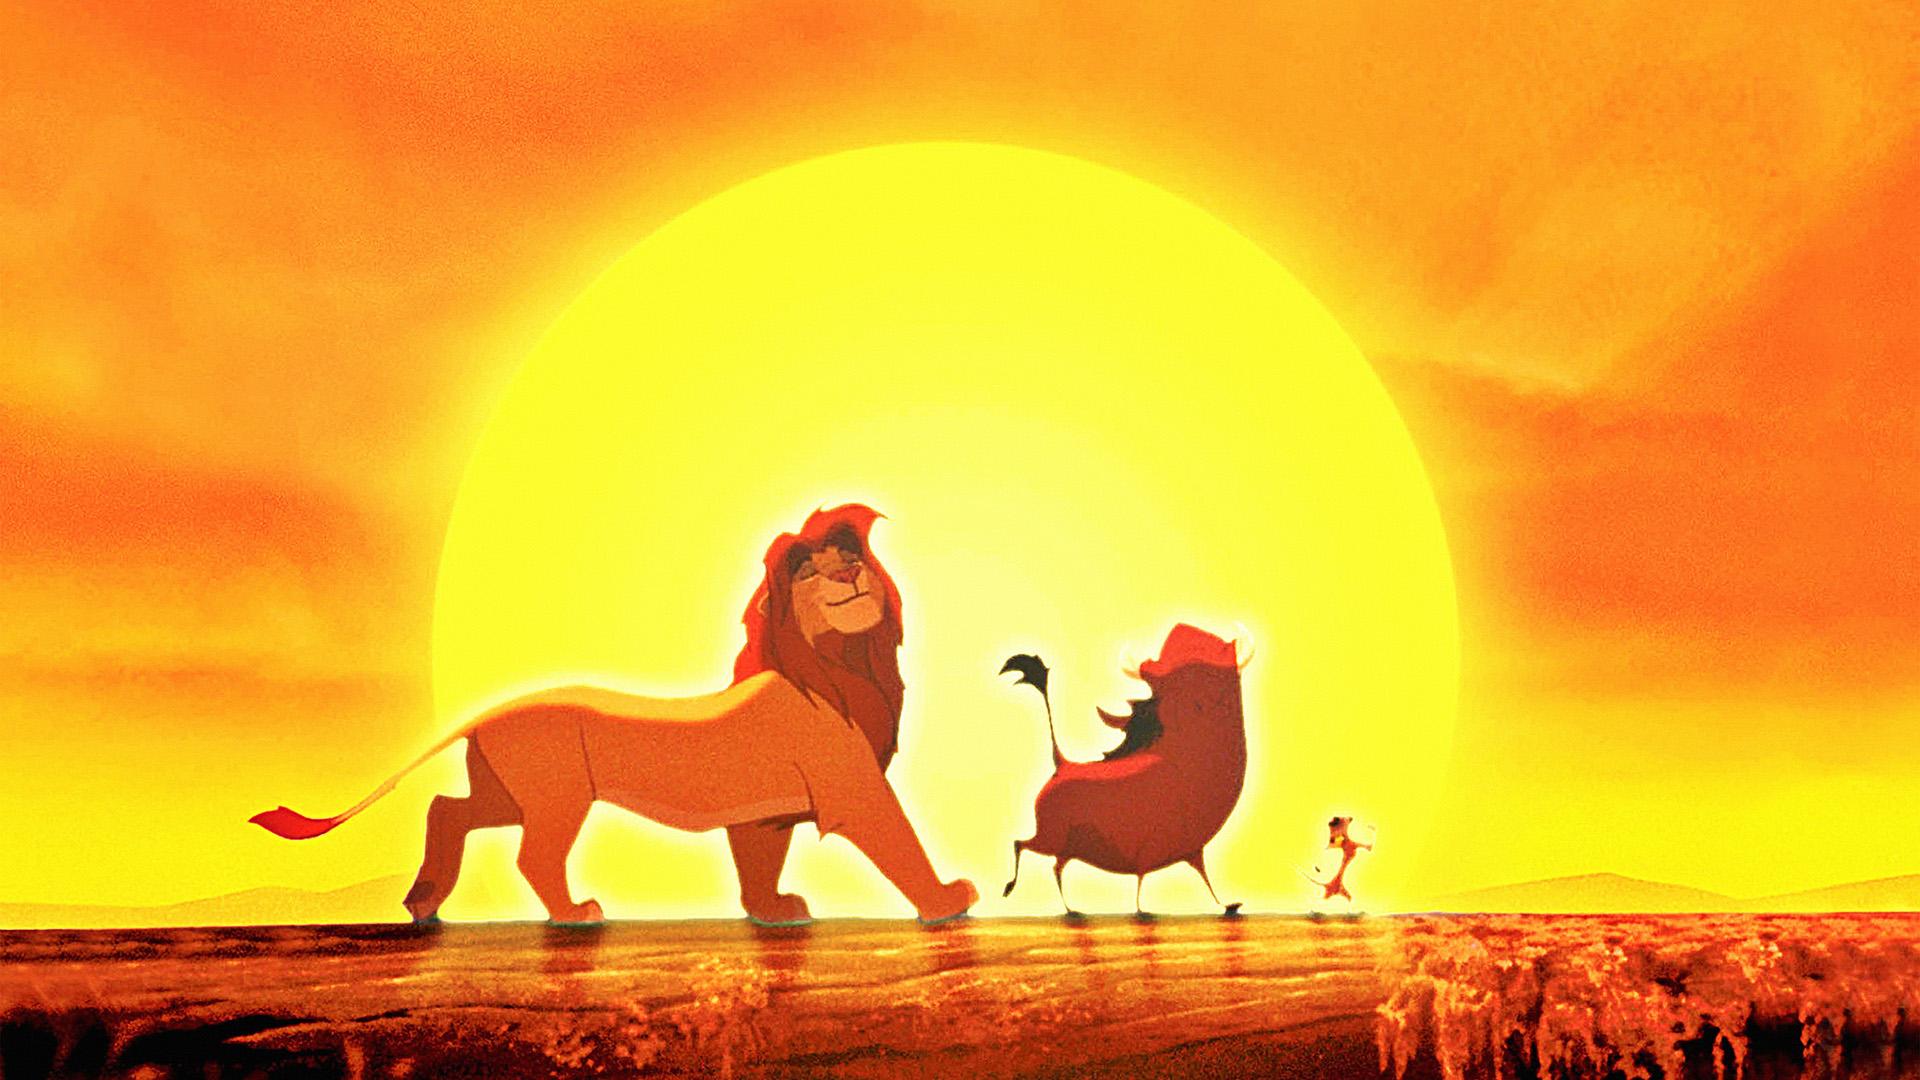 The Lion King 2019 Hd Poster Cast Nala